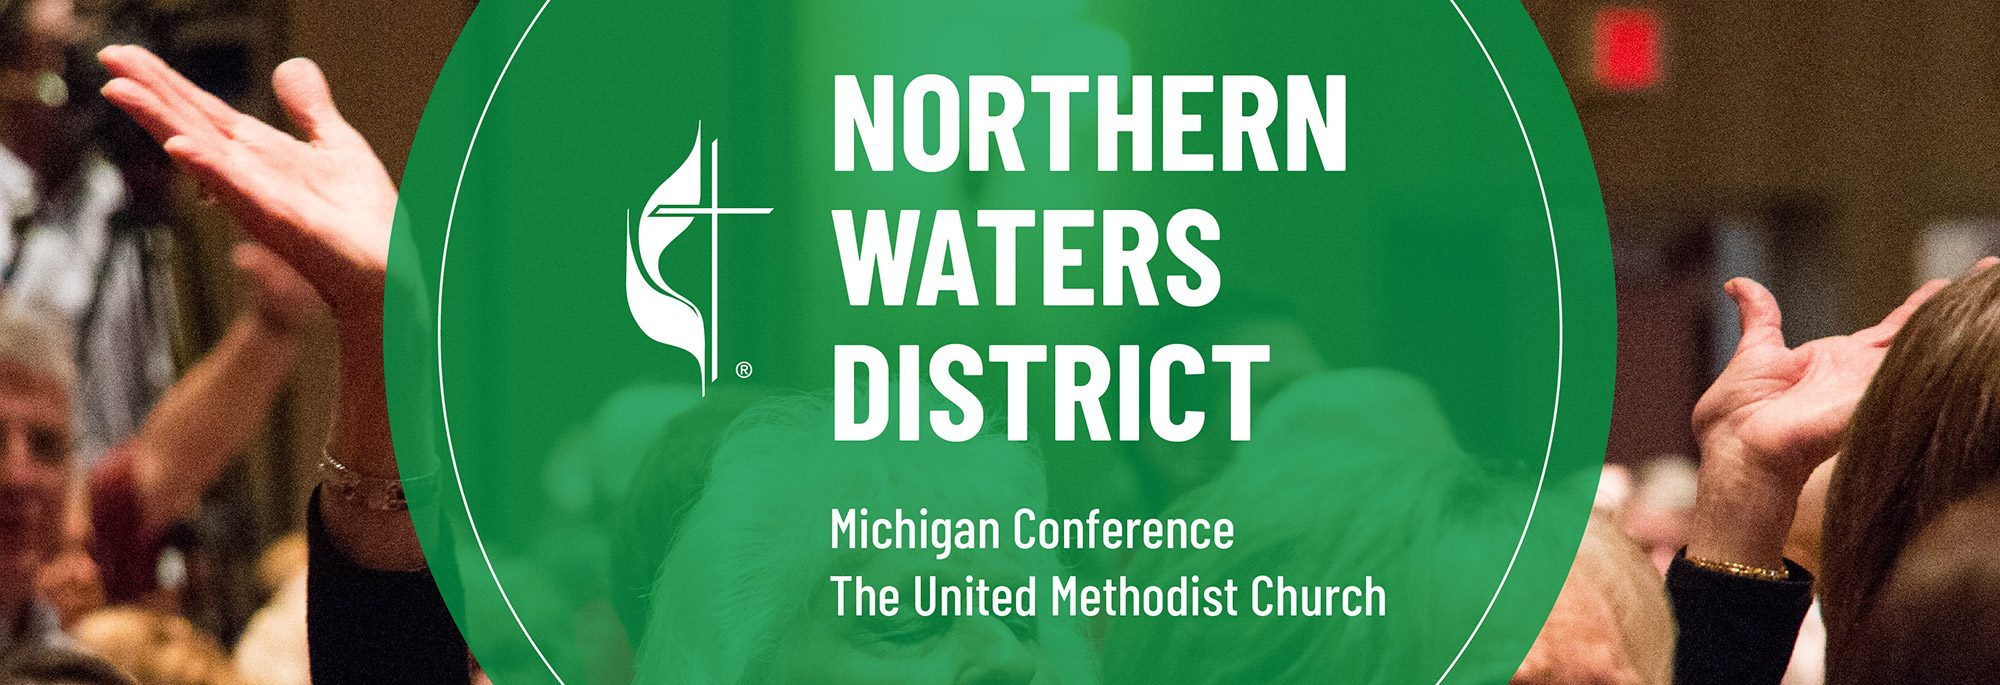 Northern Waters District Header